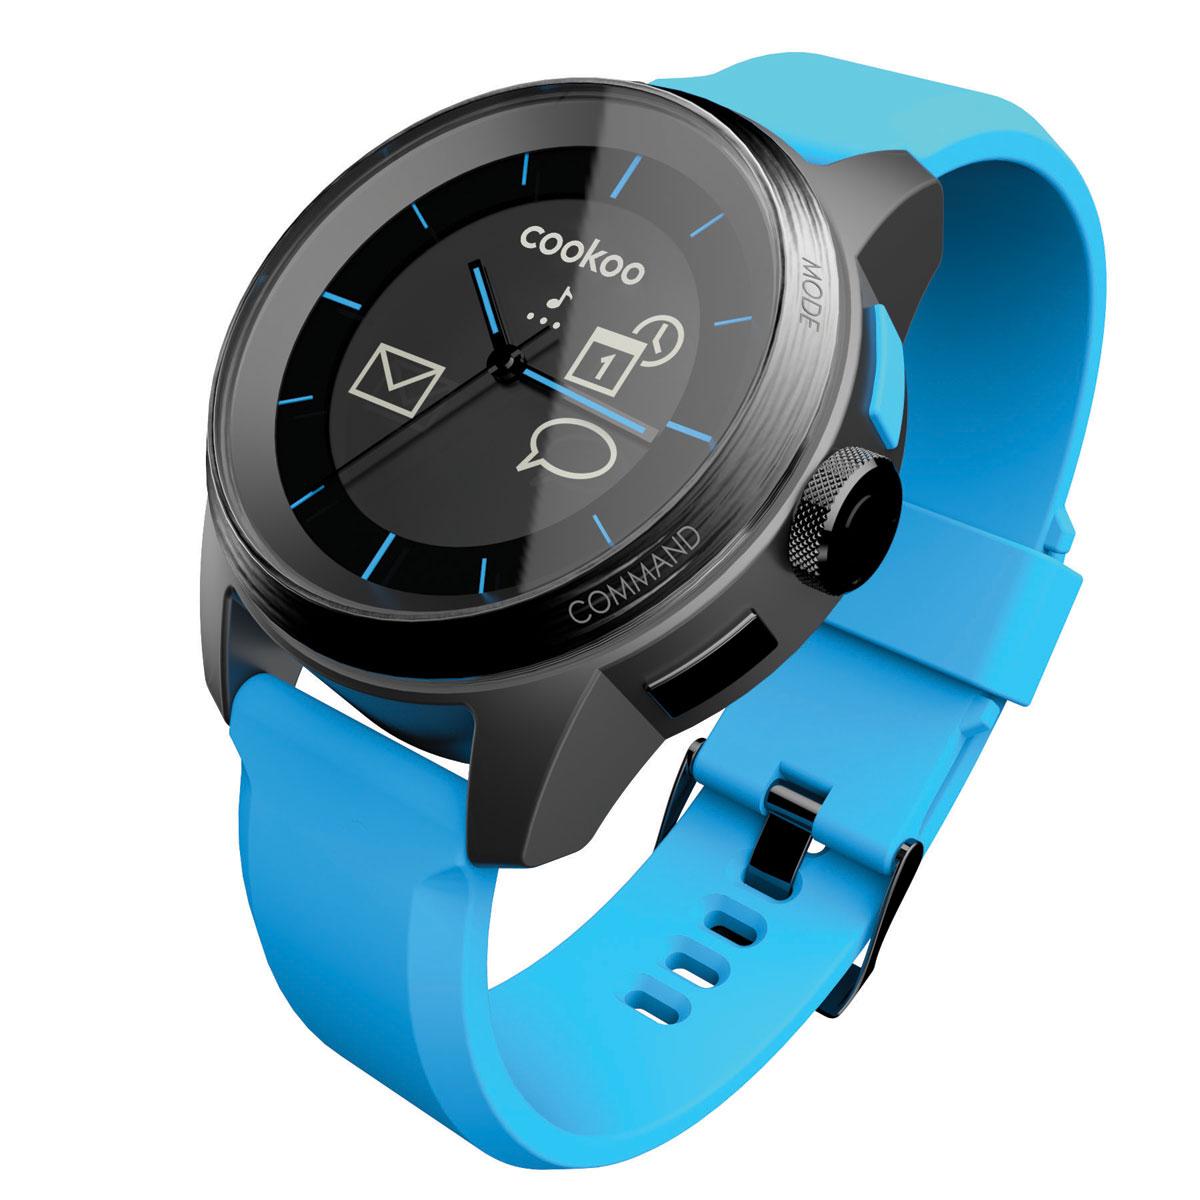 cookoo watch noir bleu montre bracelets connect s cookoo sur ldlc. Black Bedroom Furniture Sets. Home Design Ideas